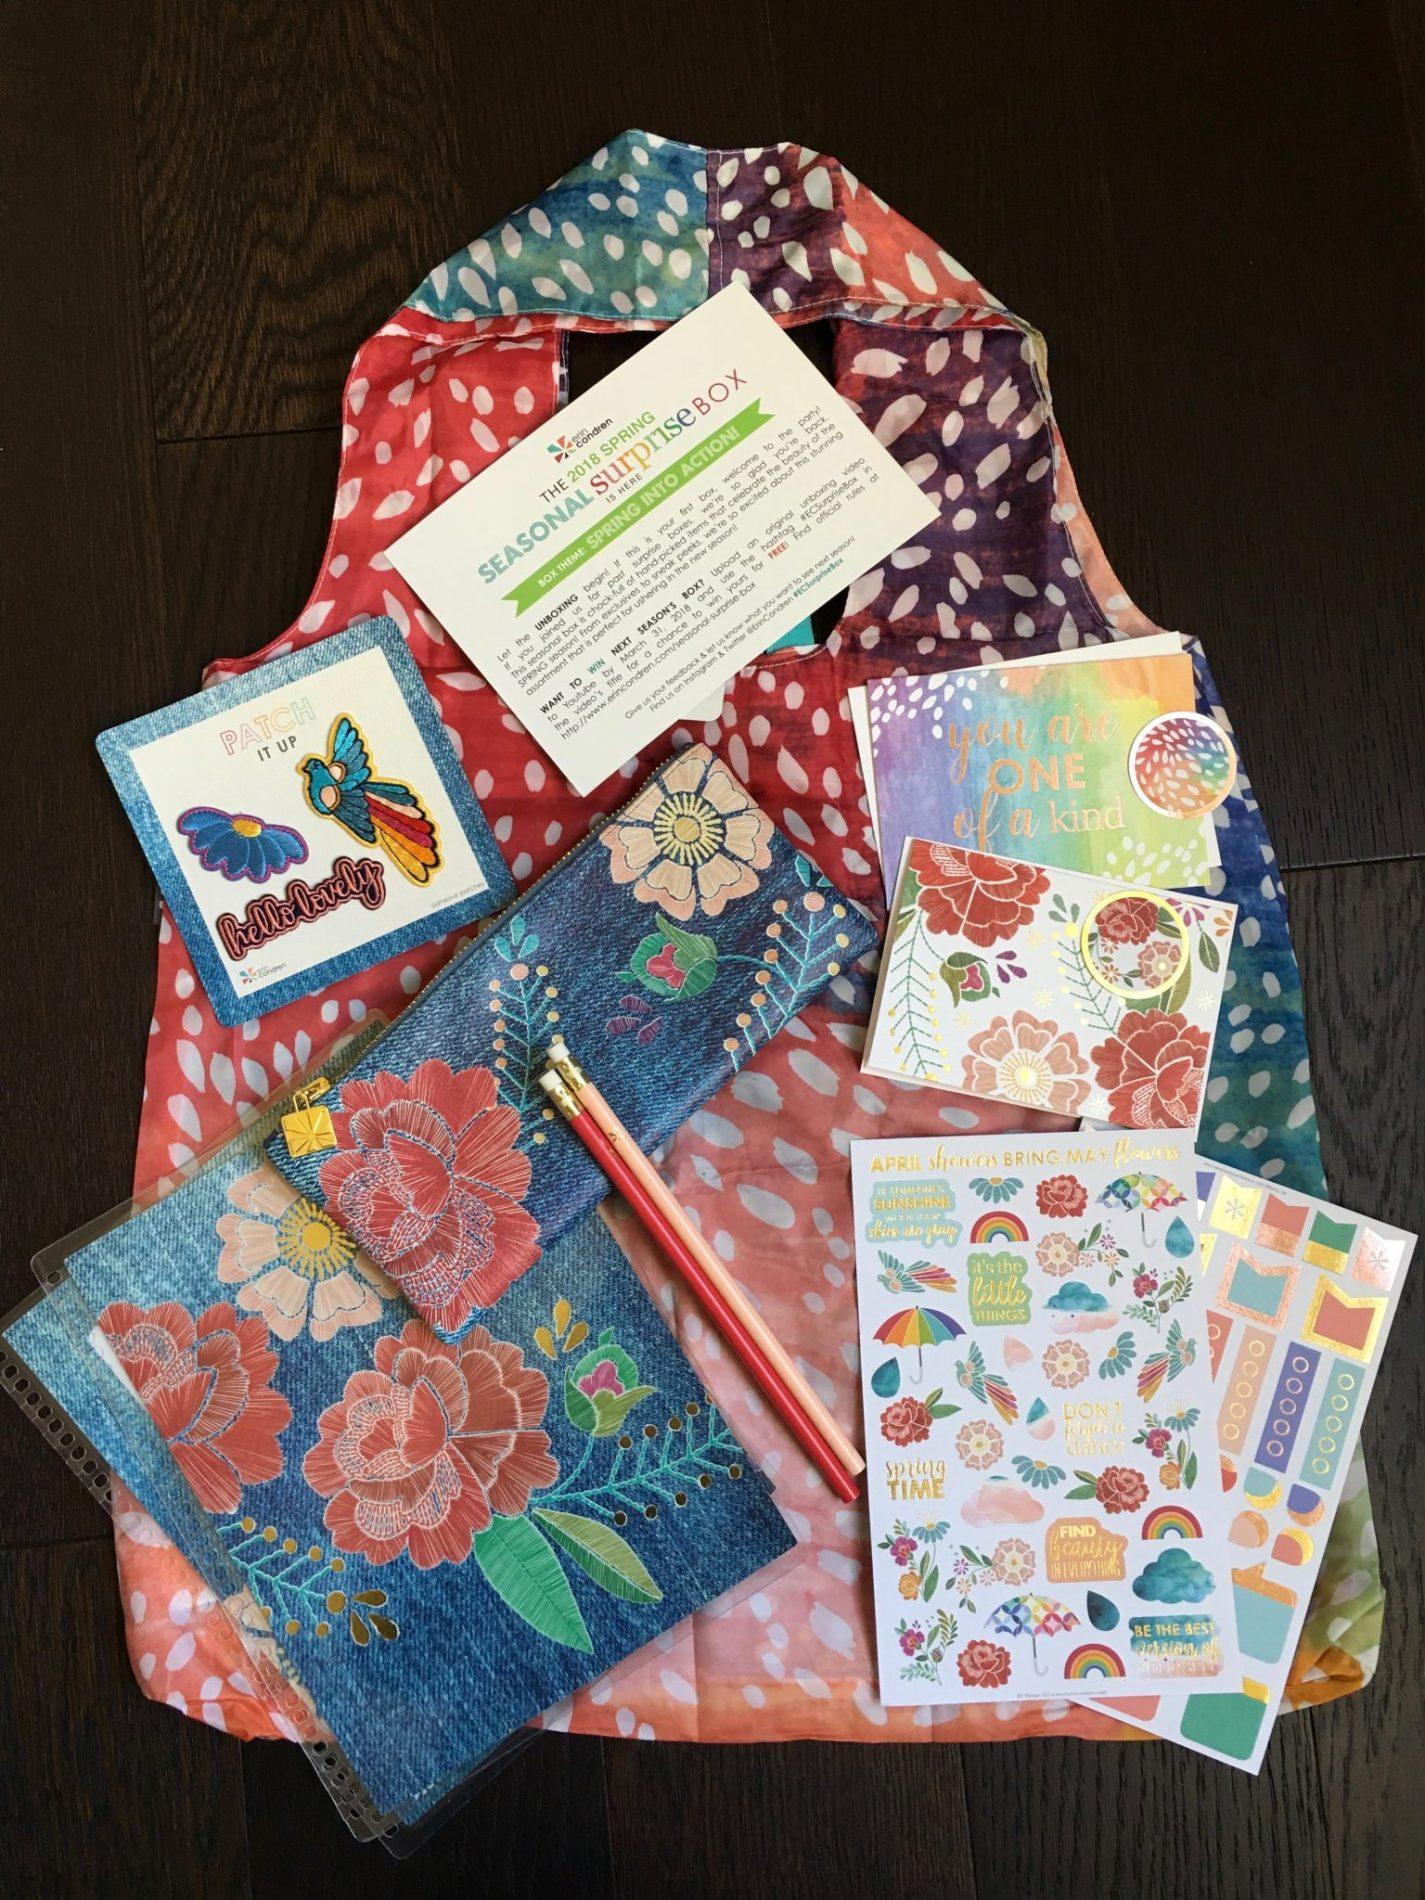 Erin Condren Spring 2018 Seasonal Surprise Box Giveaway (CLOSED)